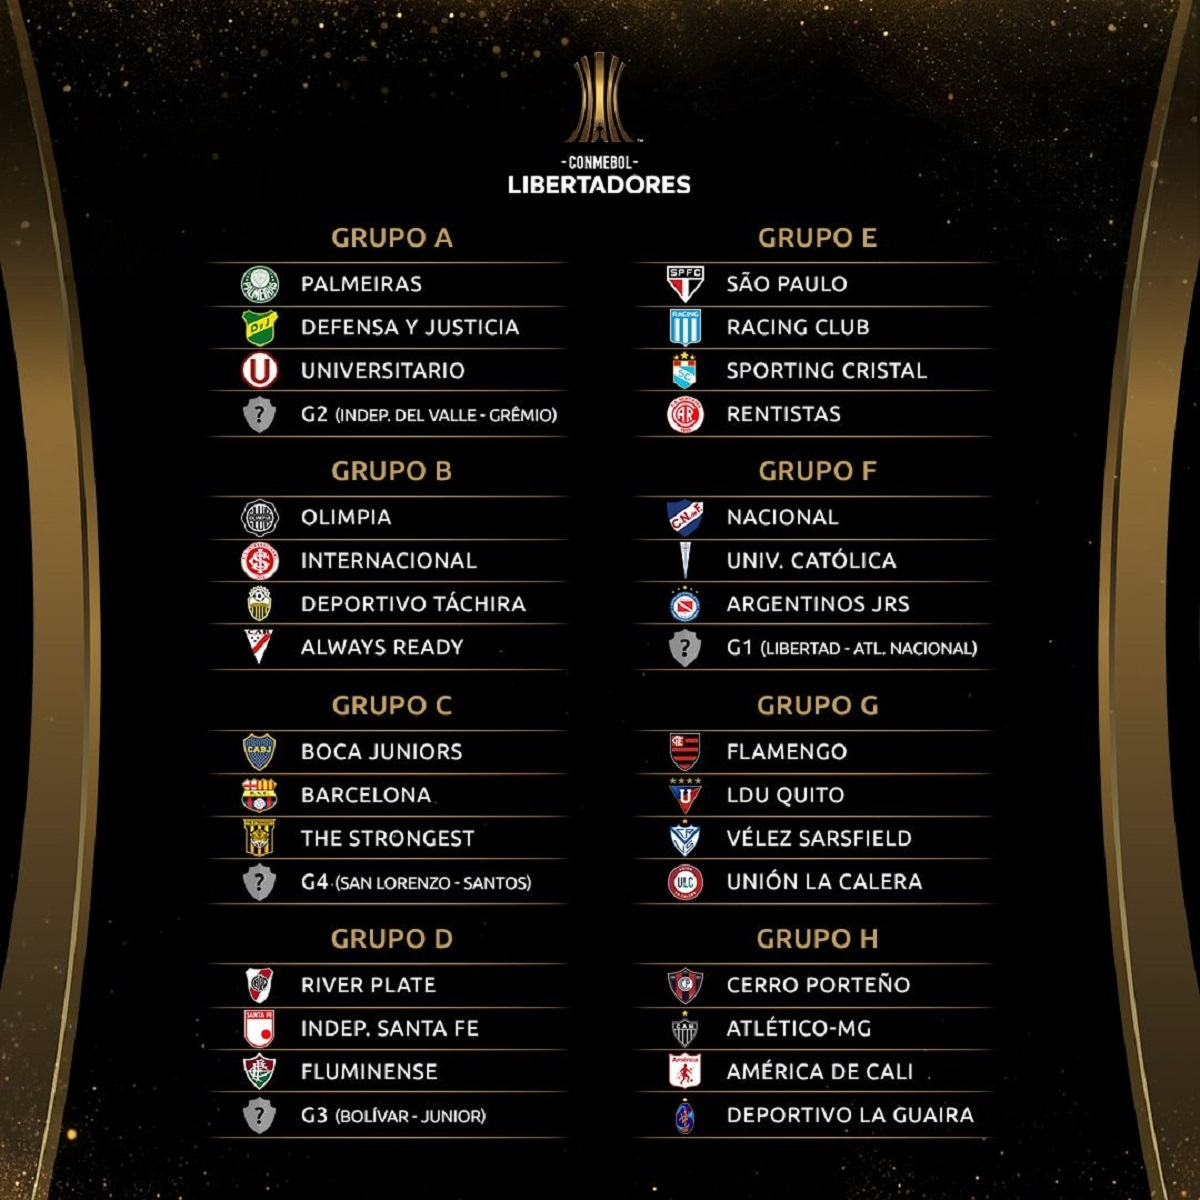 copa libertadores 2021 calendario partite squadre argentine